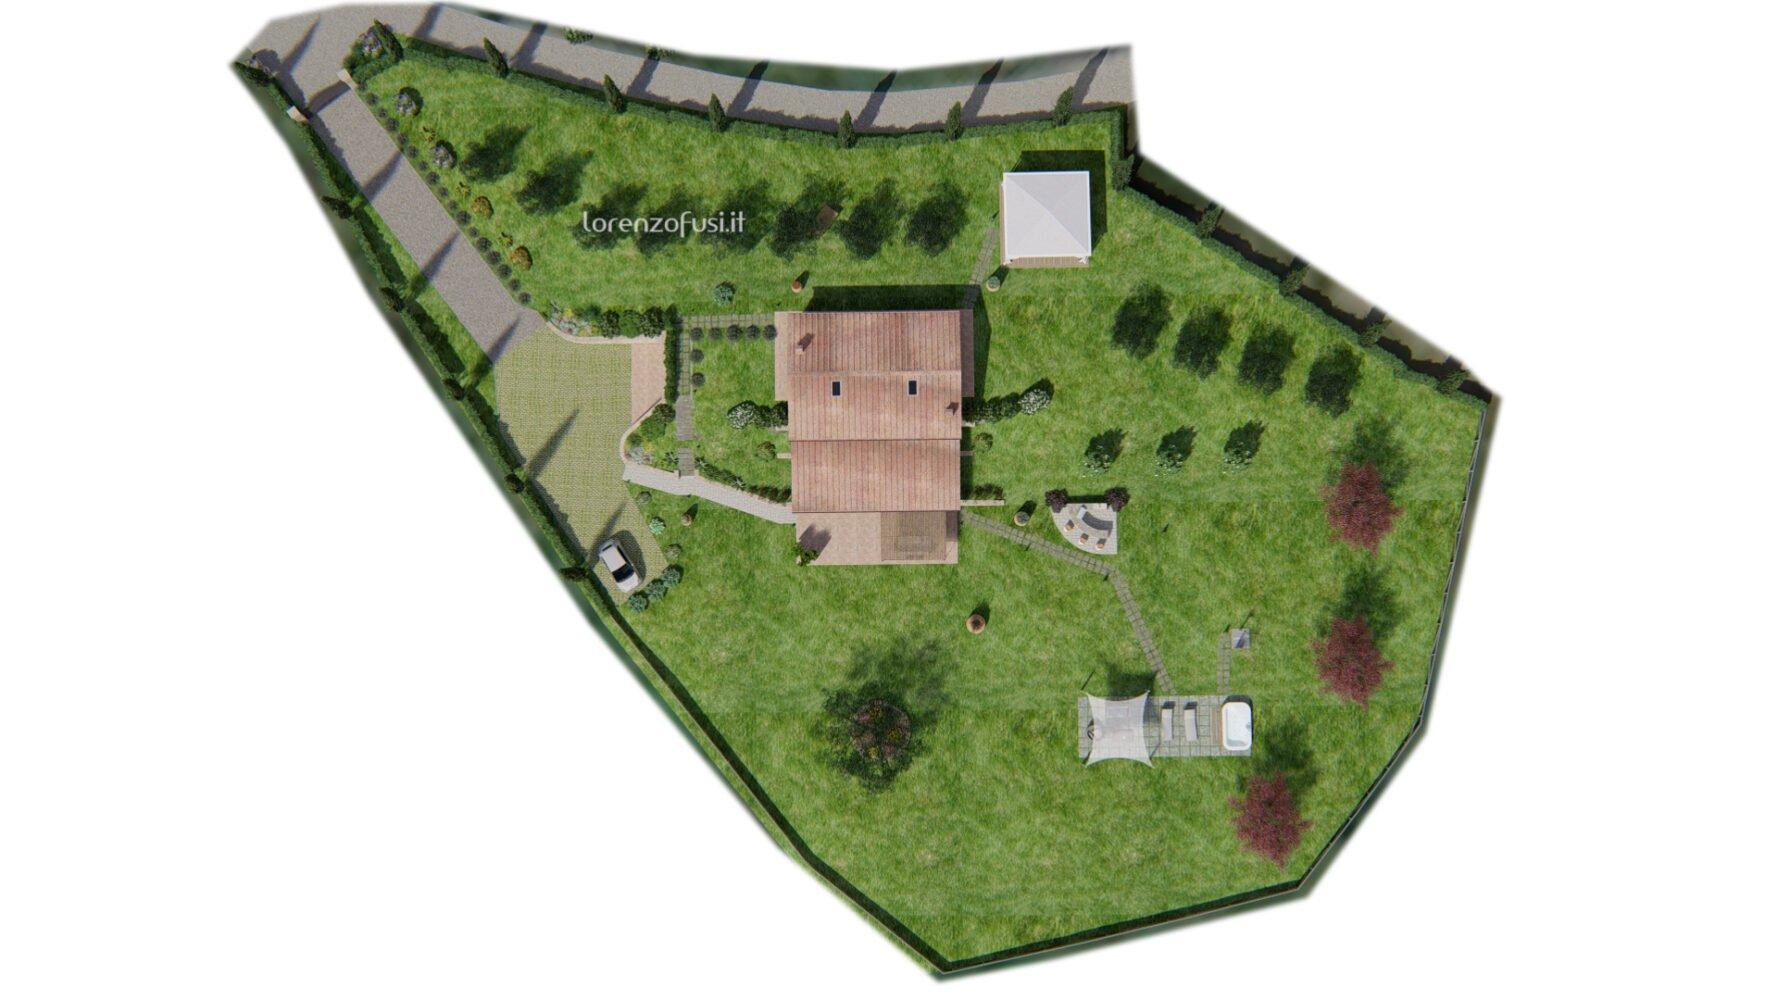 planimetry of the property land